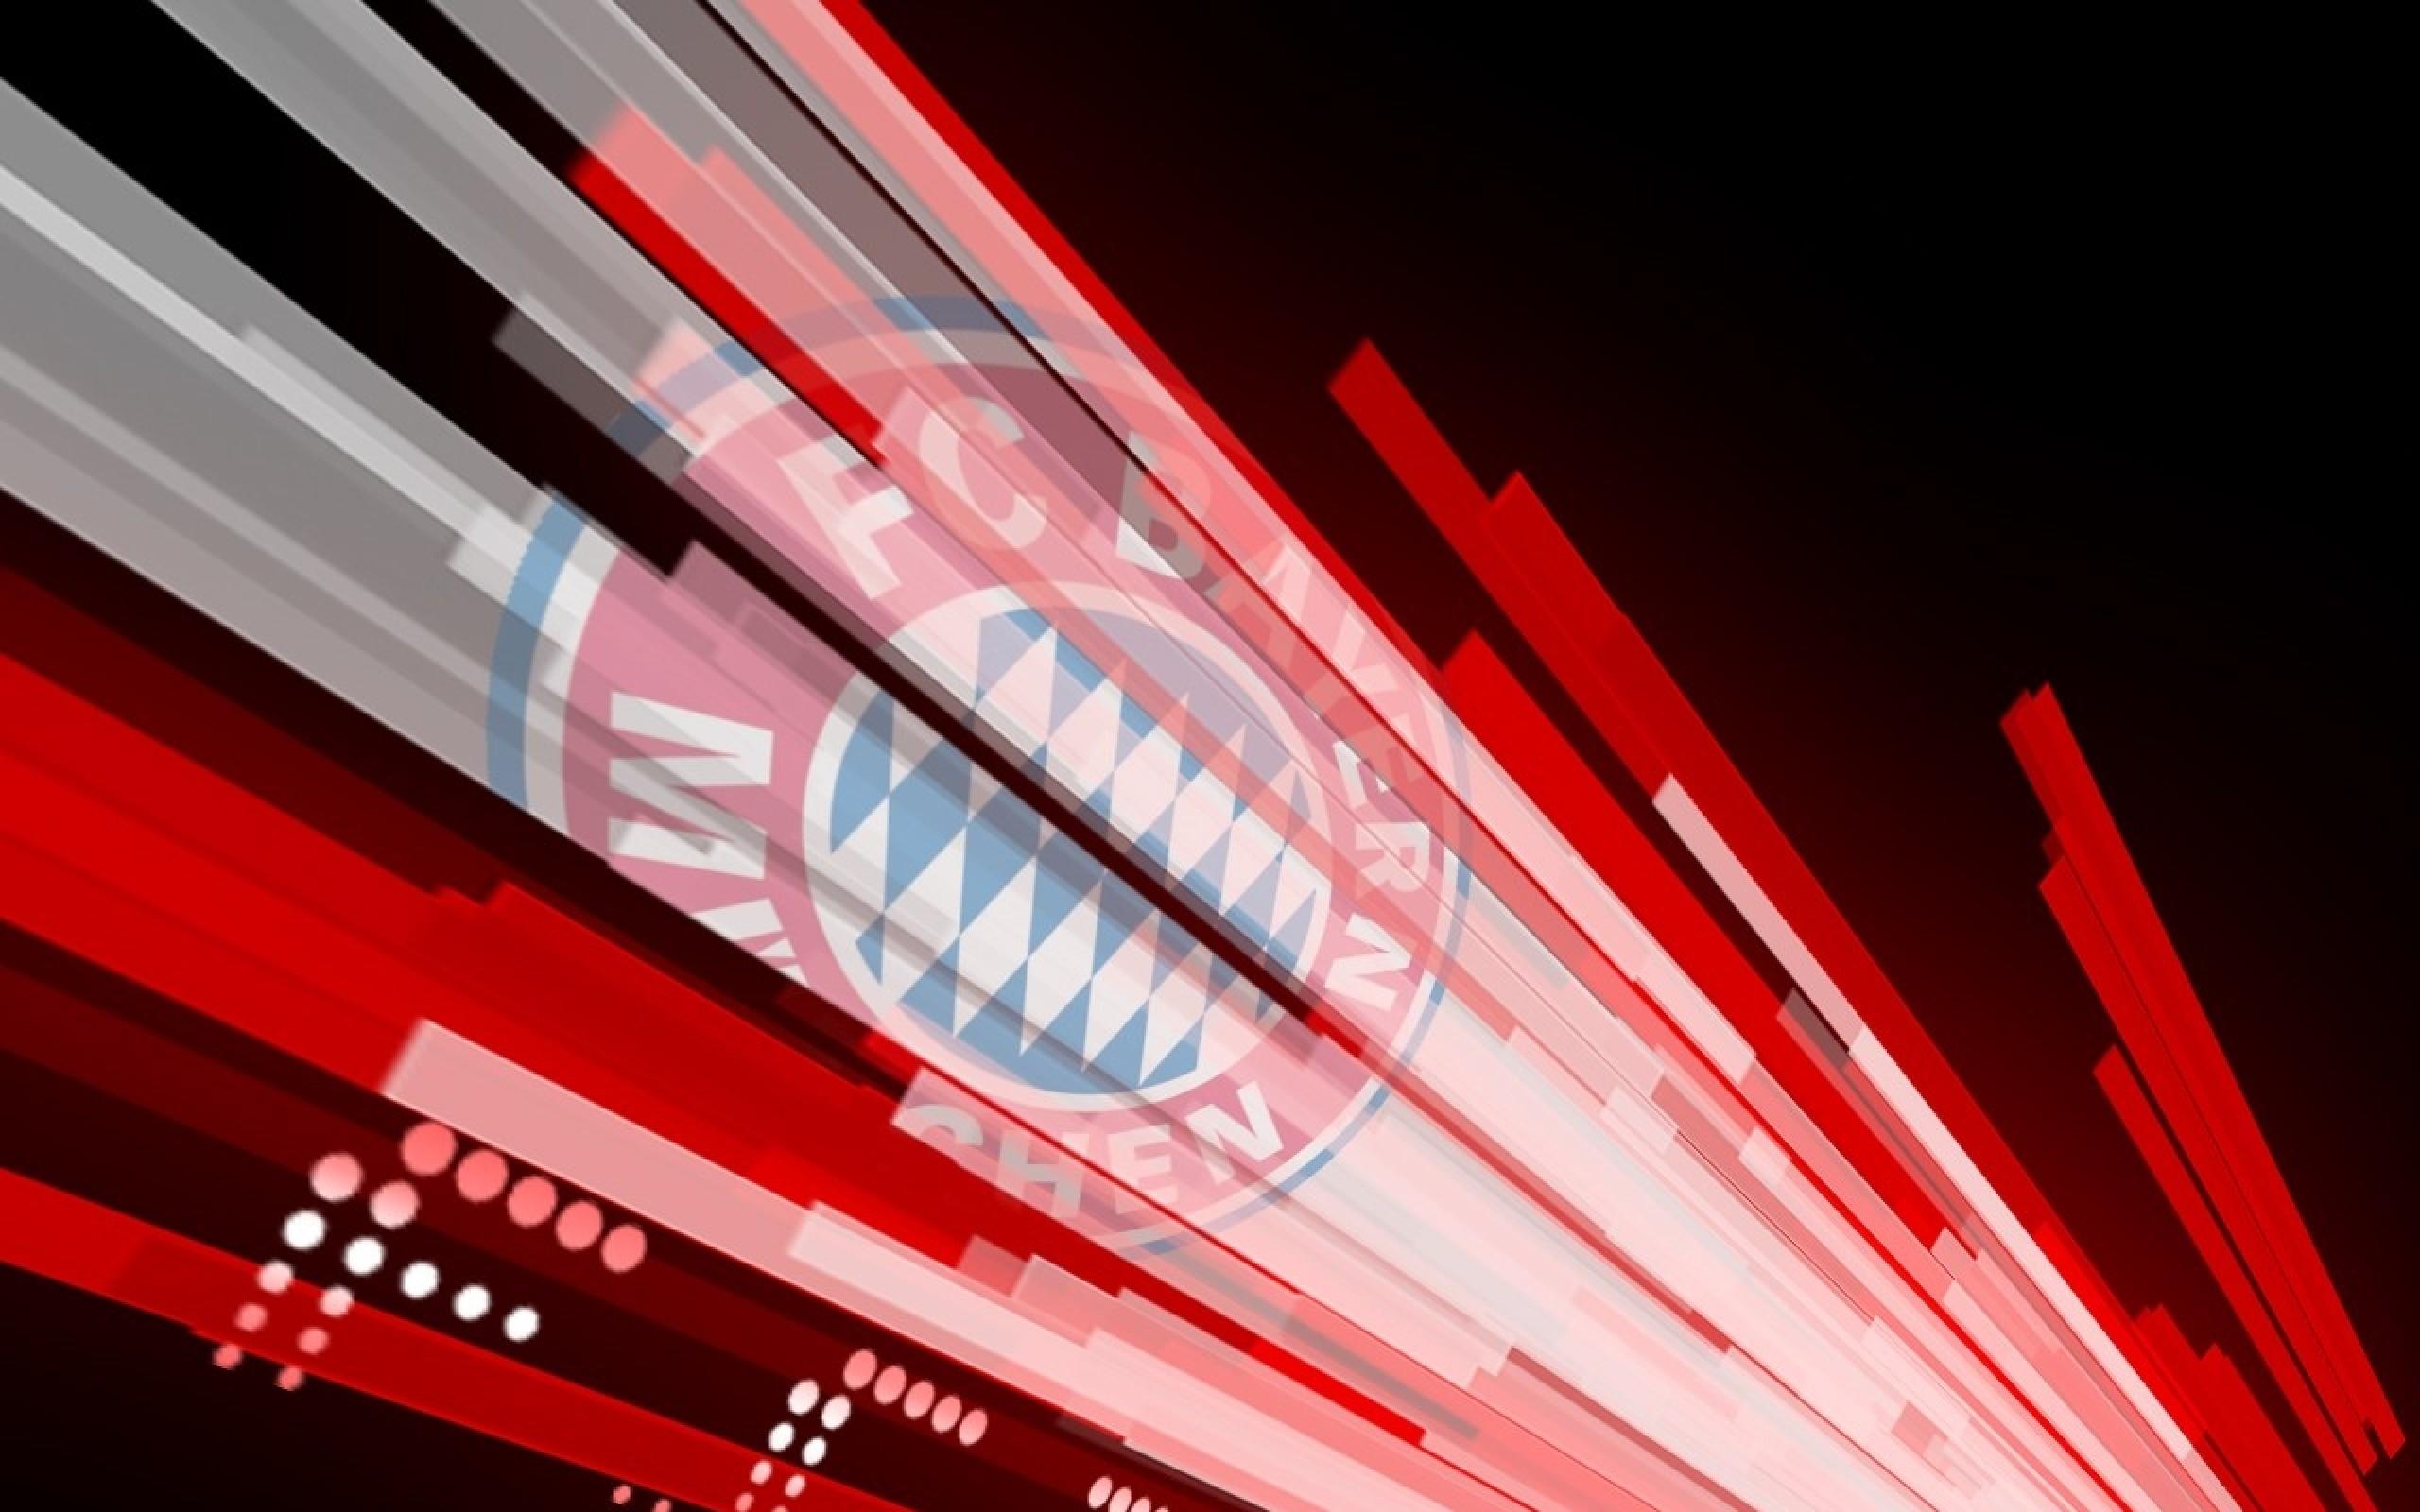 Fc bayern munich hd wallpapers 77 images 1920x1080 fc bayern mnchen ultras 001 hd voltagebd Images